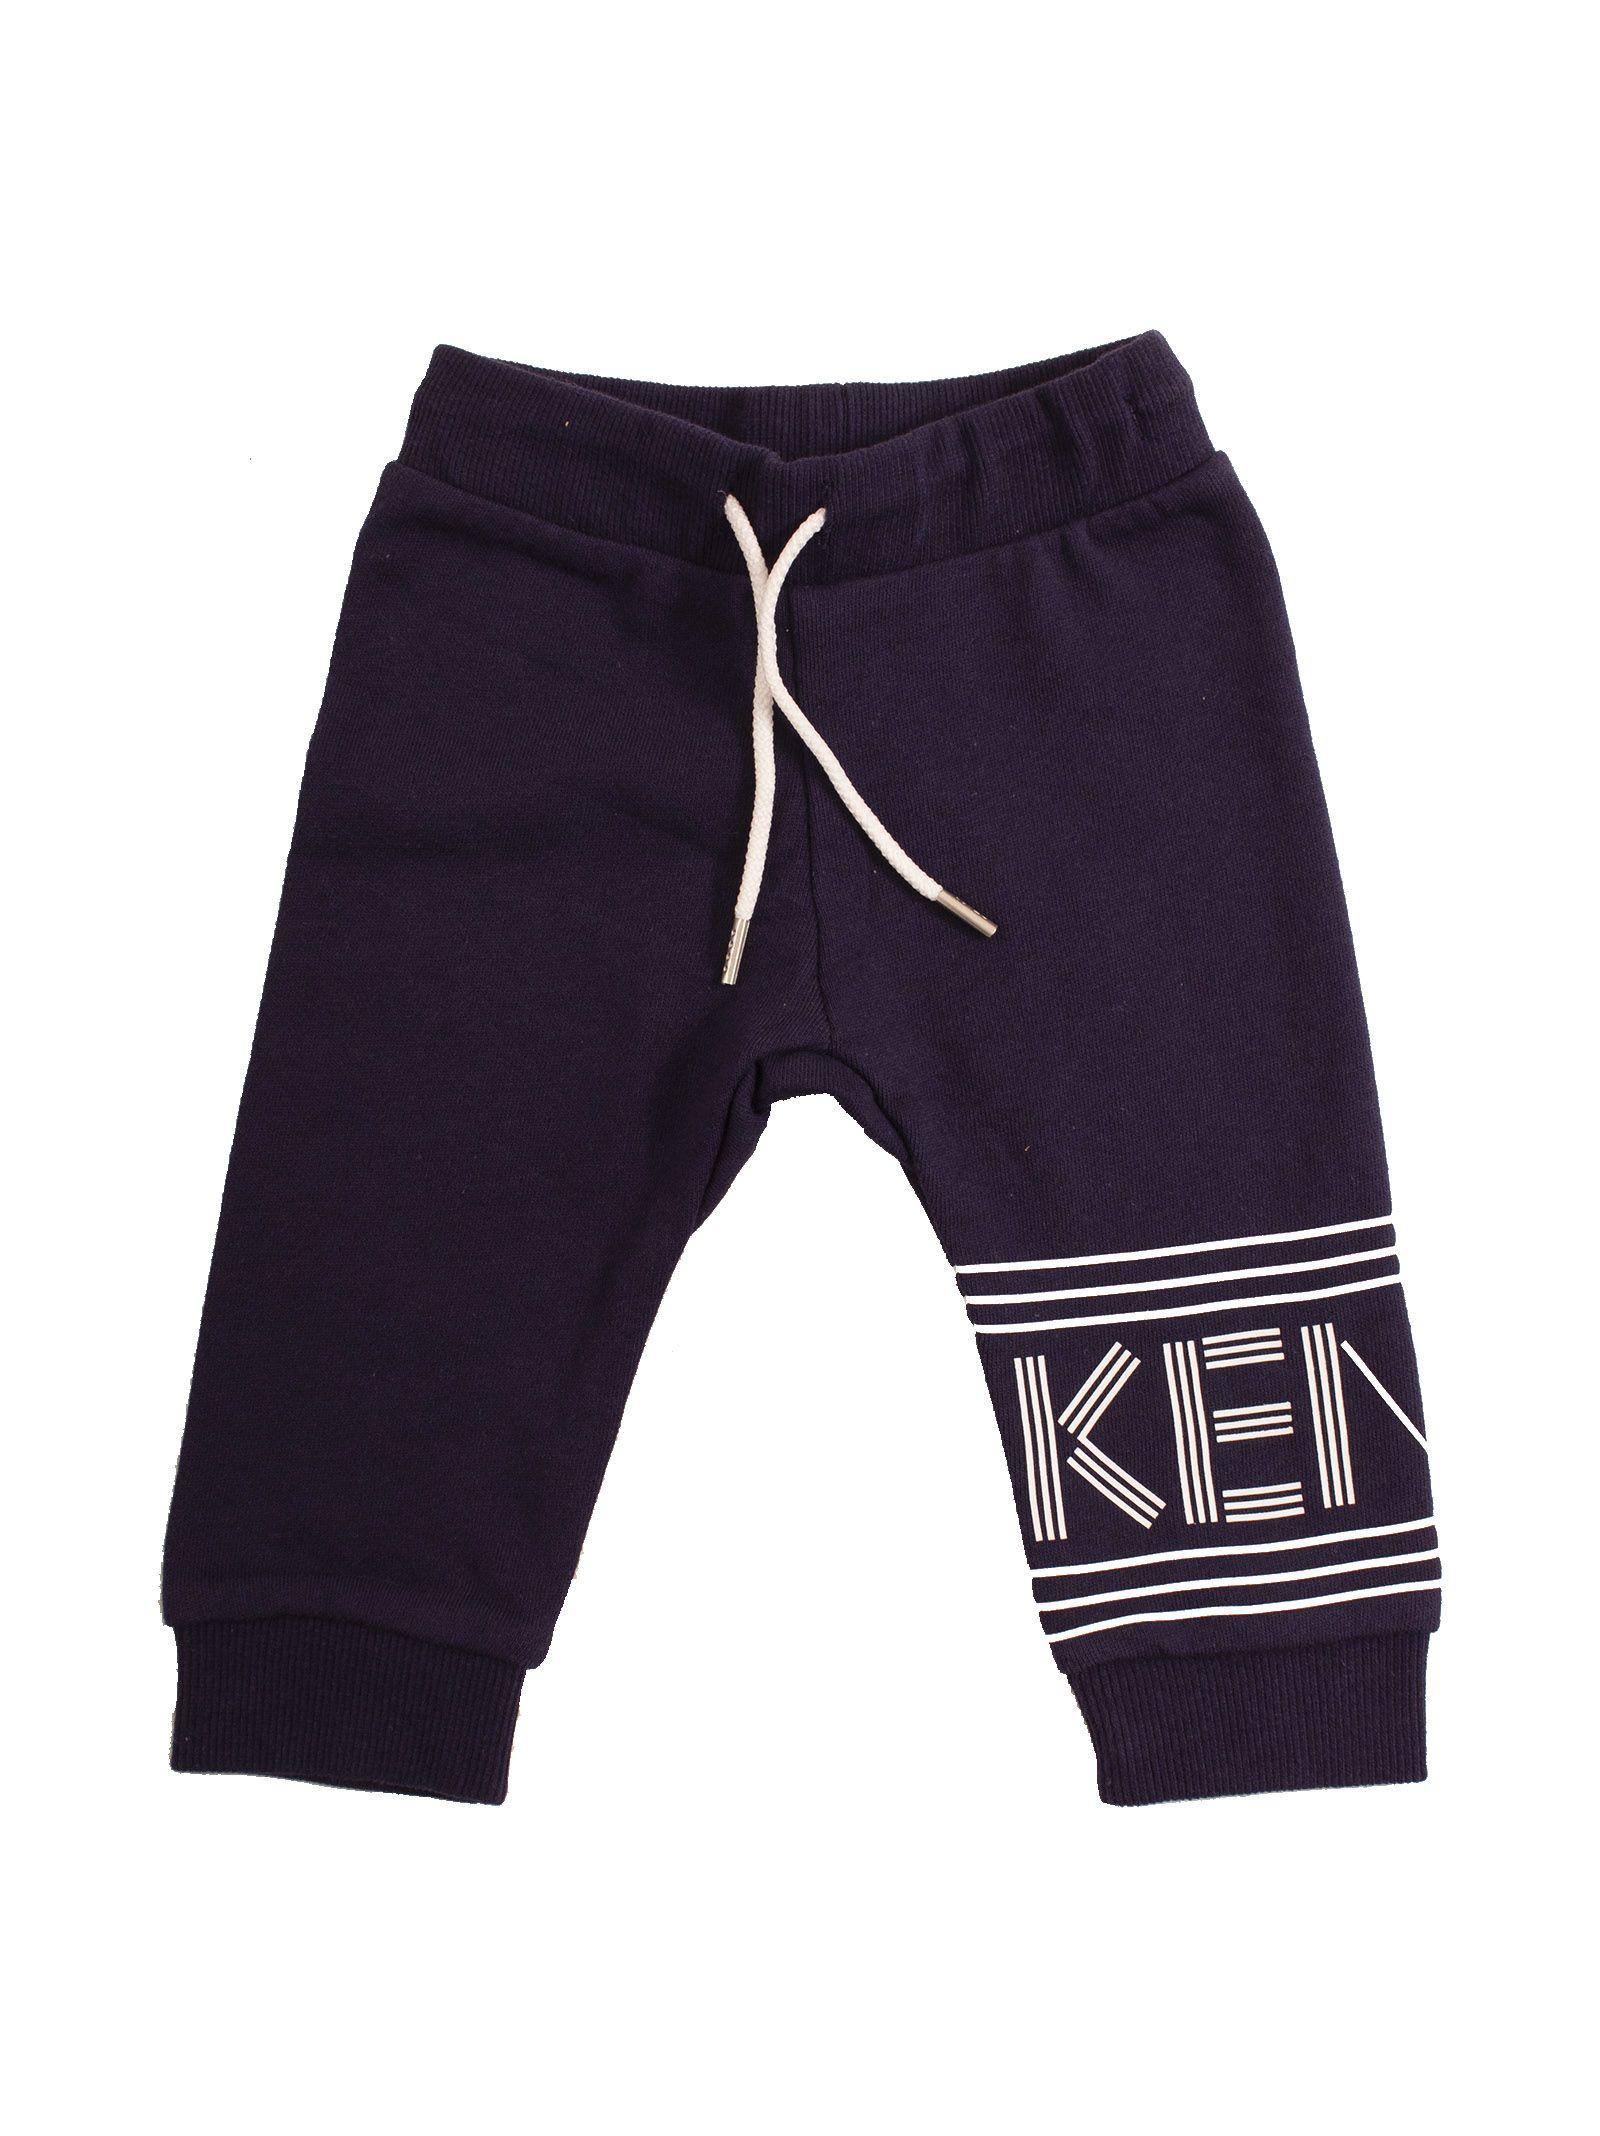 5462442ede75 Kenzo Kids Kenzo Kids Logo Striped Tracksuit - Black - 10906115 ...